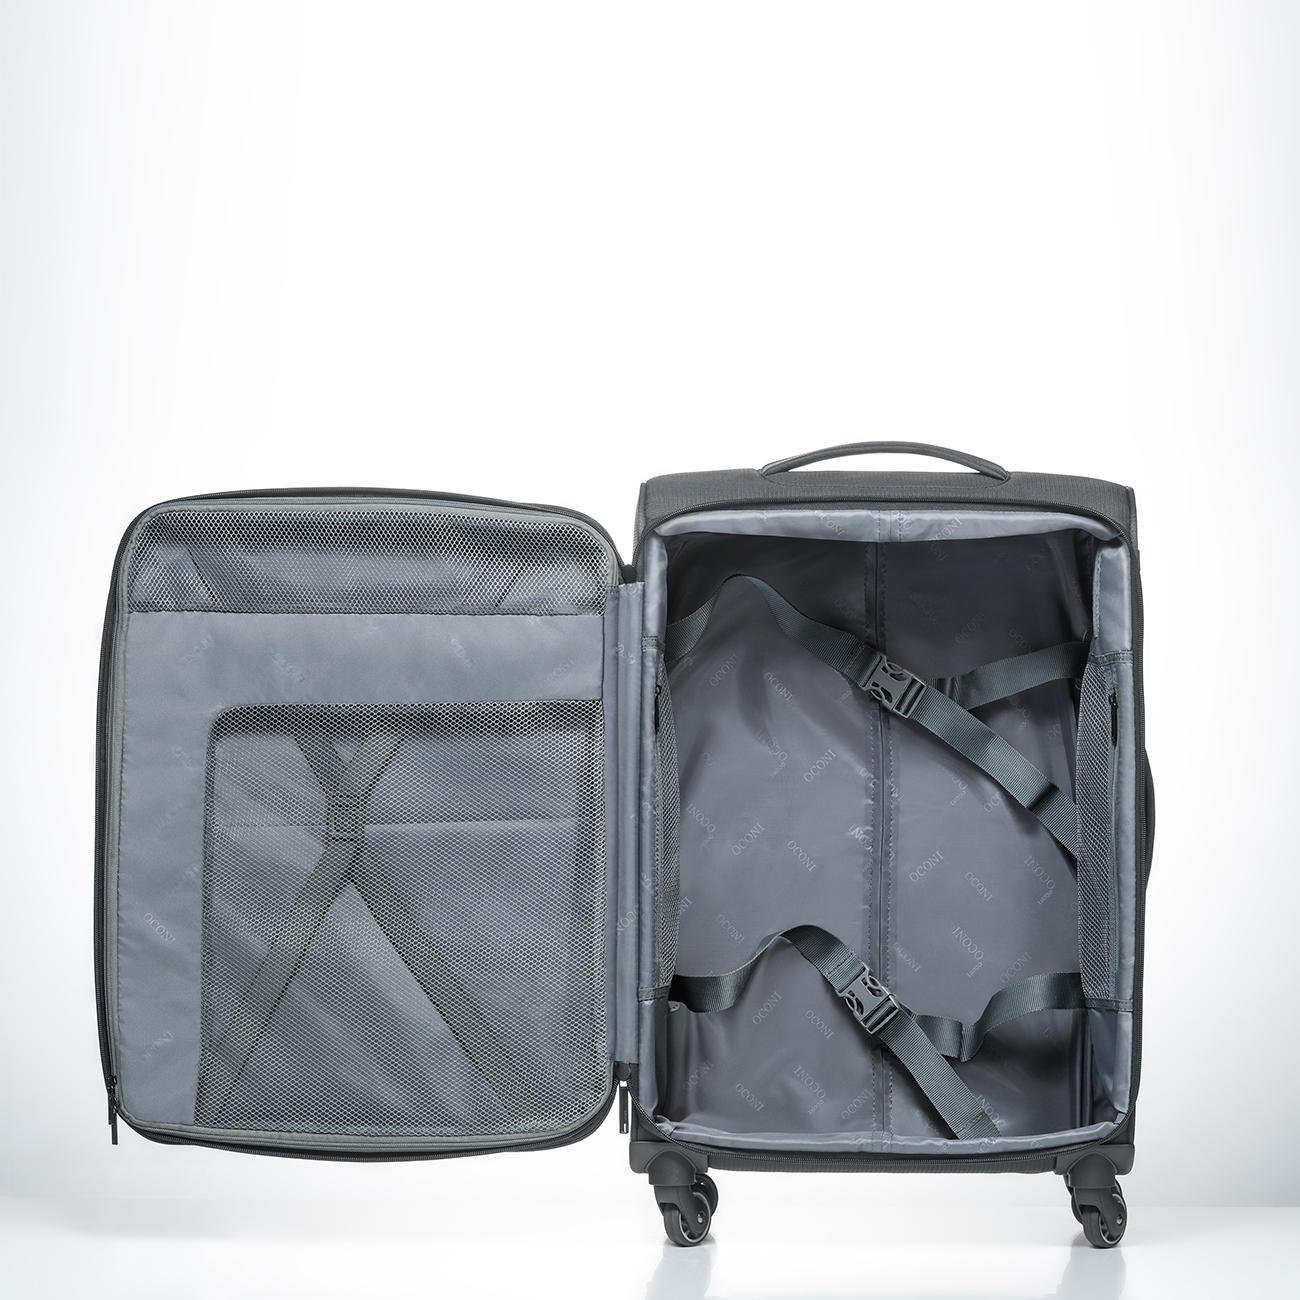 valise trolley en nylon dobby par oconi pas cher pro idee. Black Bedroom Furniture Sets. Home Design Ideas